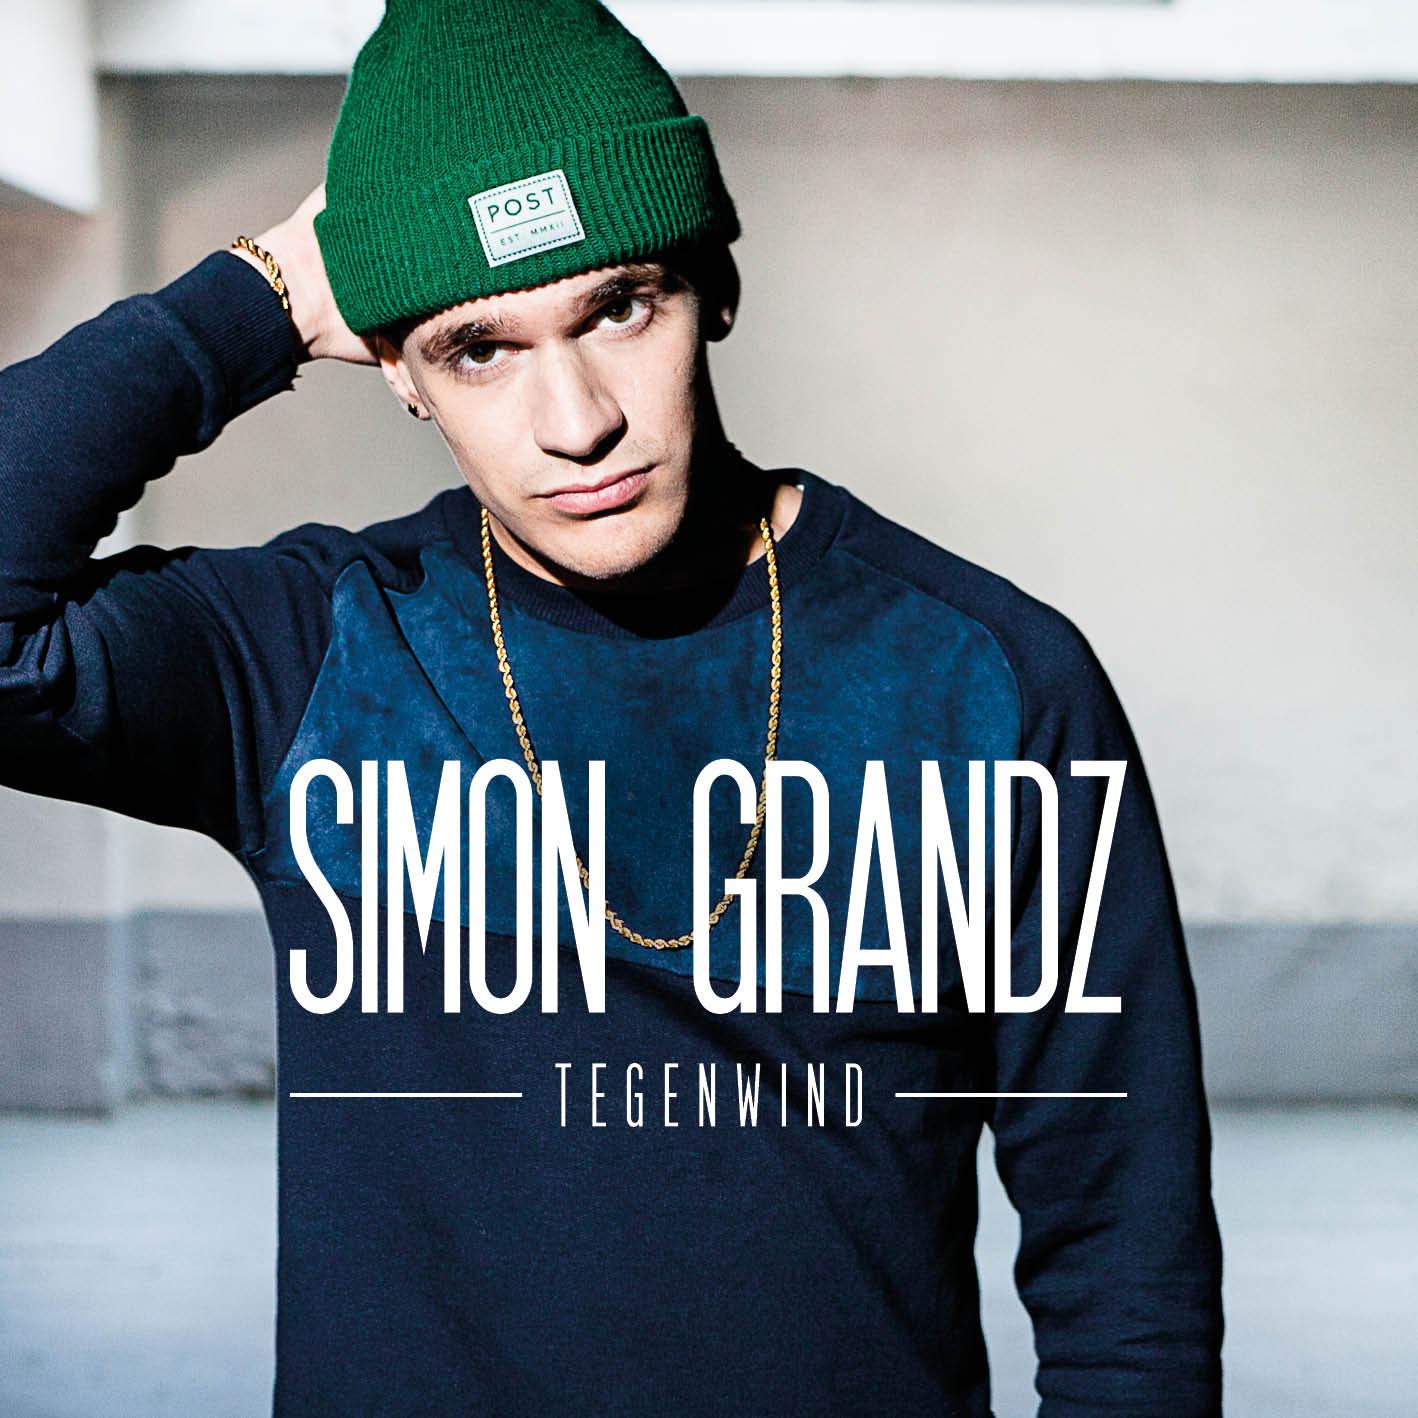 flus-simon-grandz-tegenwind-EP-download-gratis-2